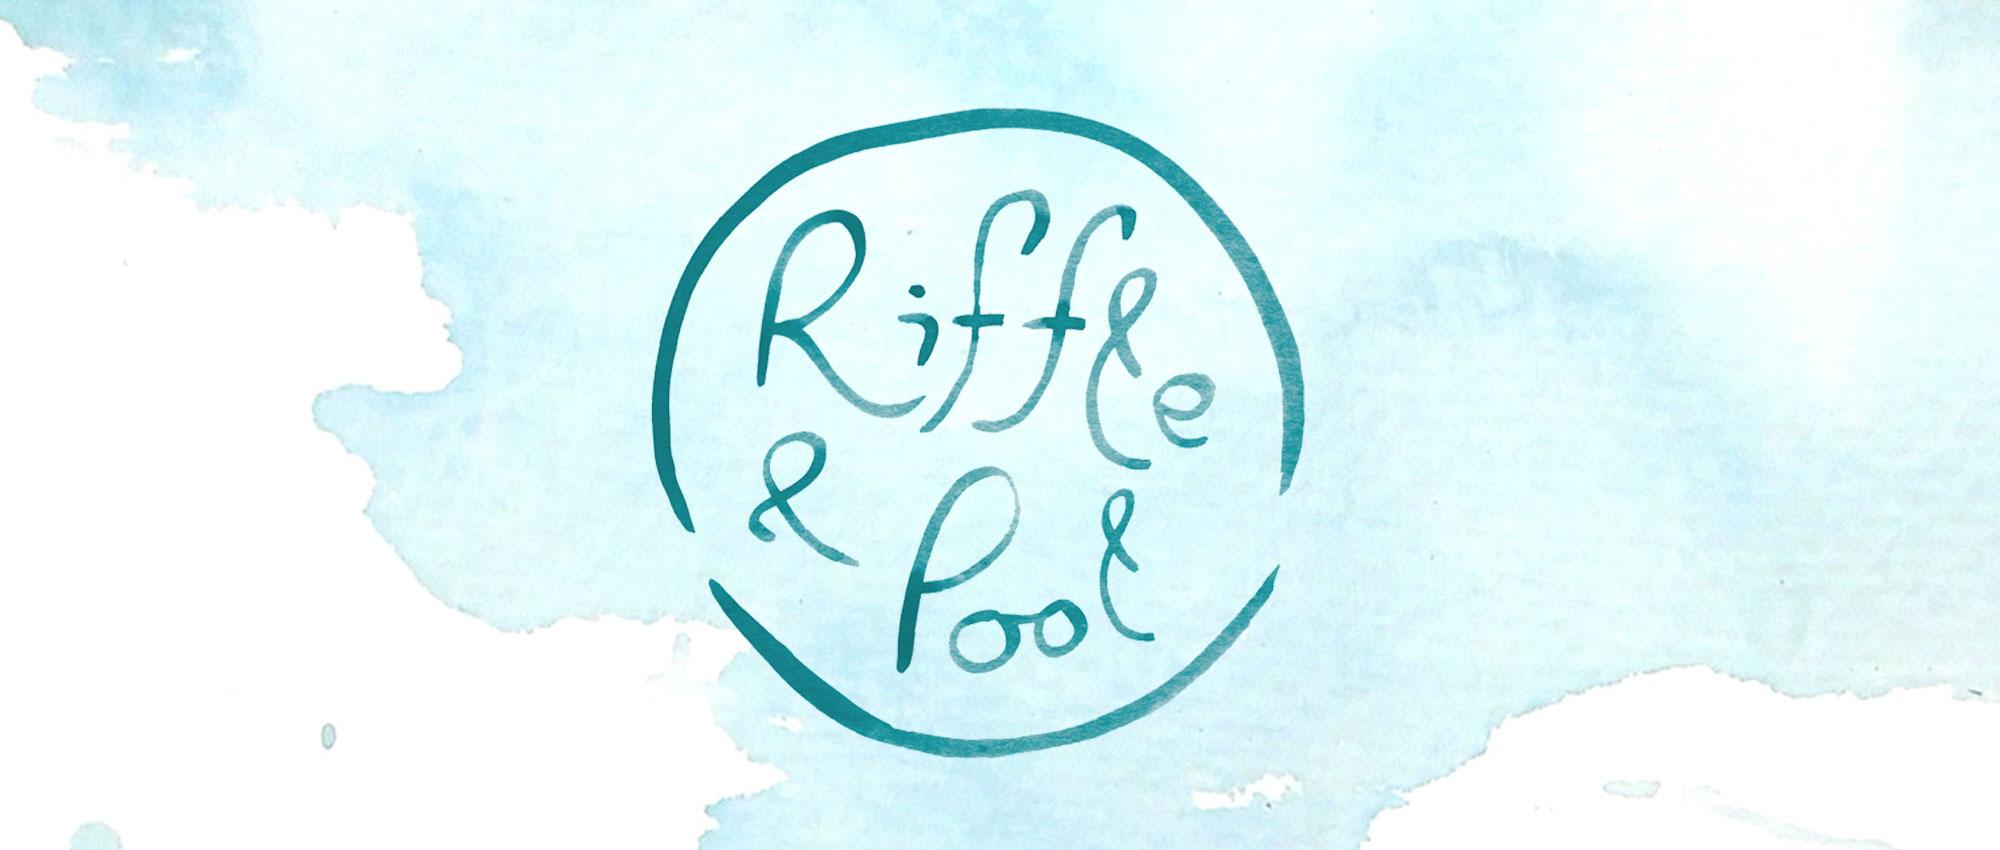 Riffle and Pool